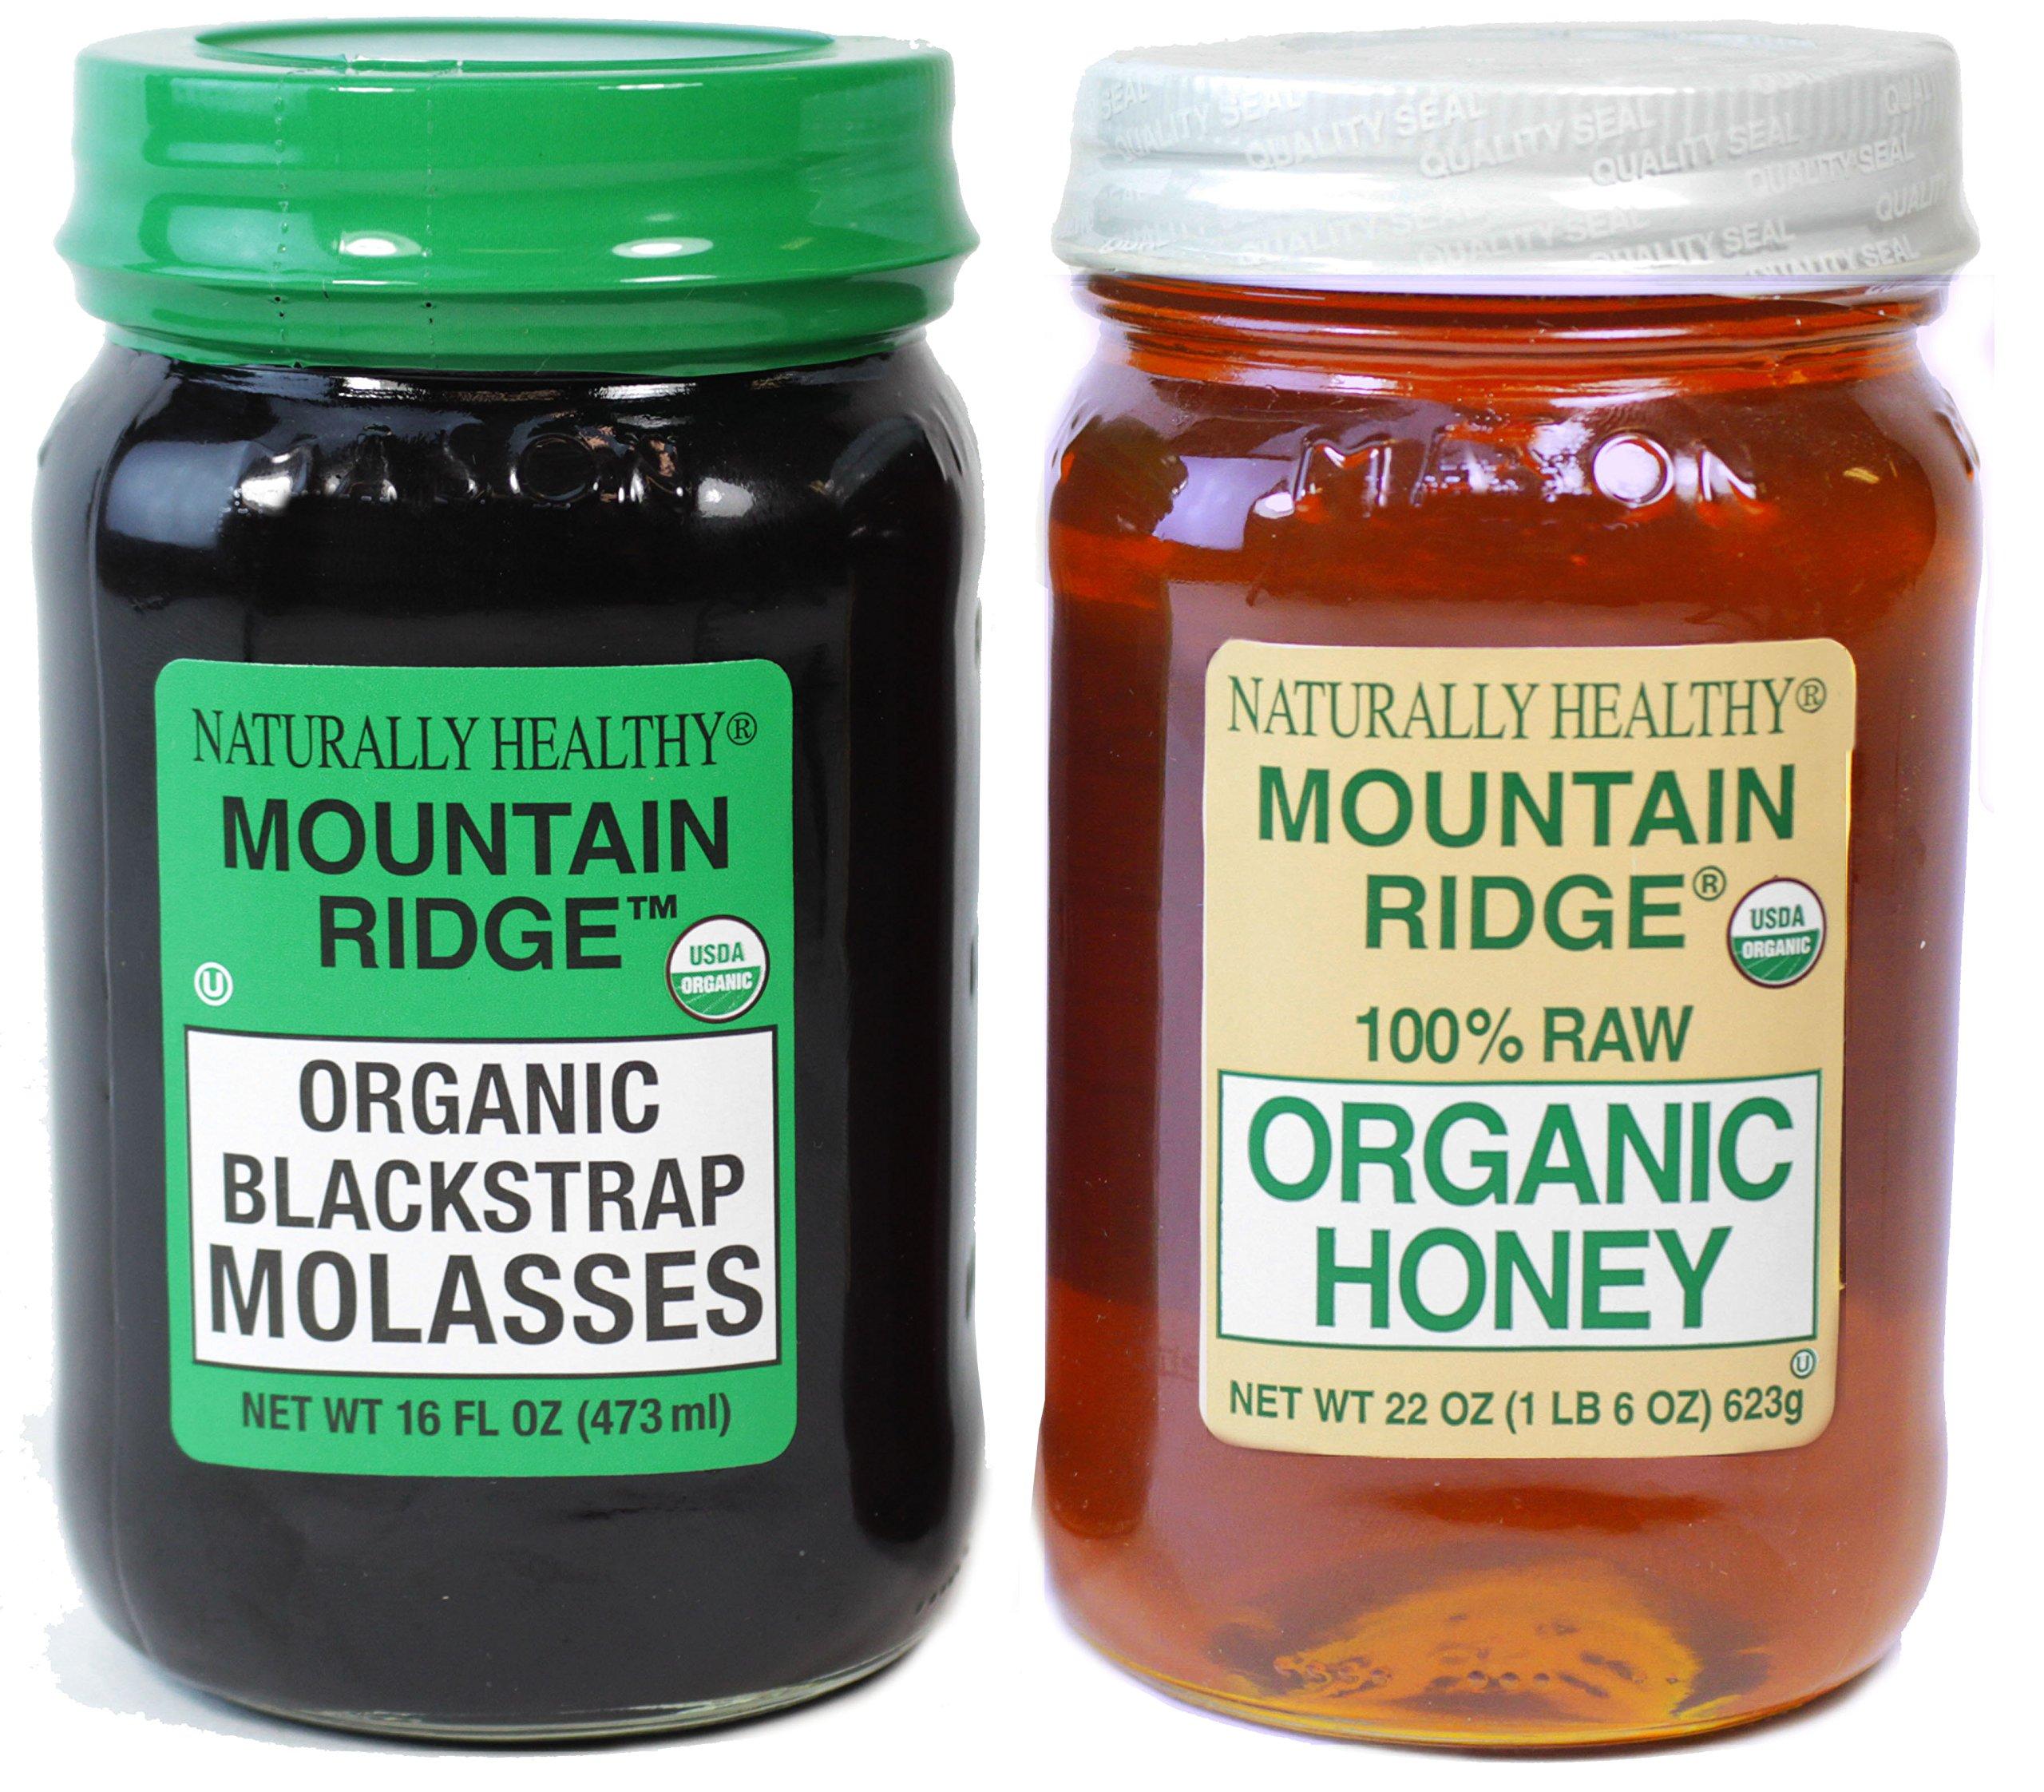 Naturally Healthy Mountain Ridge USDA Organic Combo: Organic Honey (22 Oz) and Organic Blackstrap Molasses (16 Fl Oz) in Glass Mason Jars